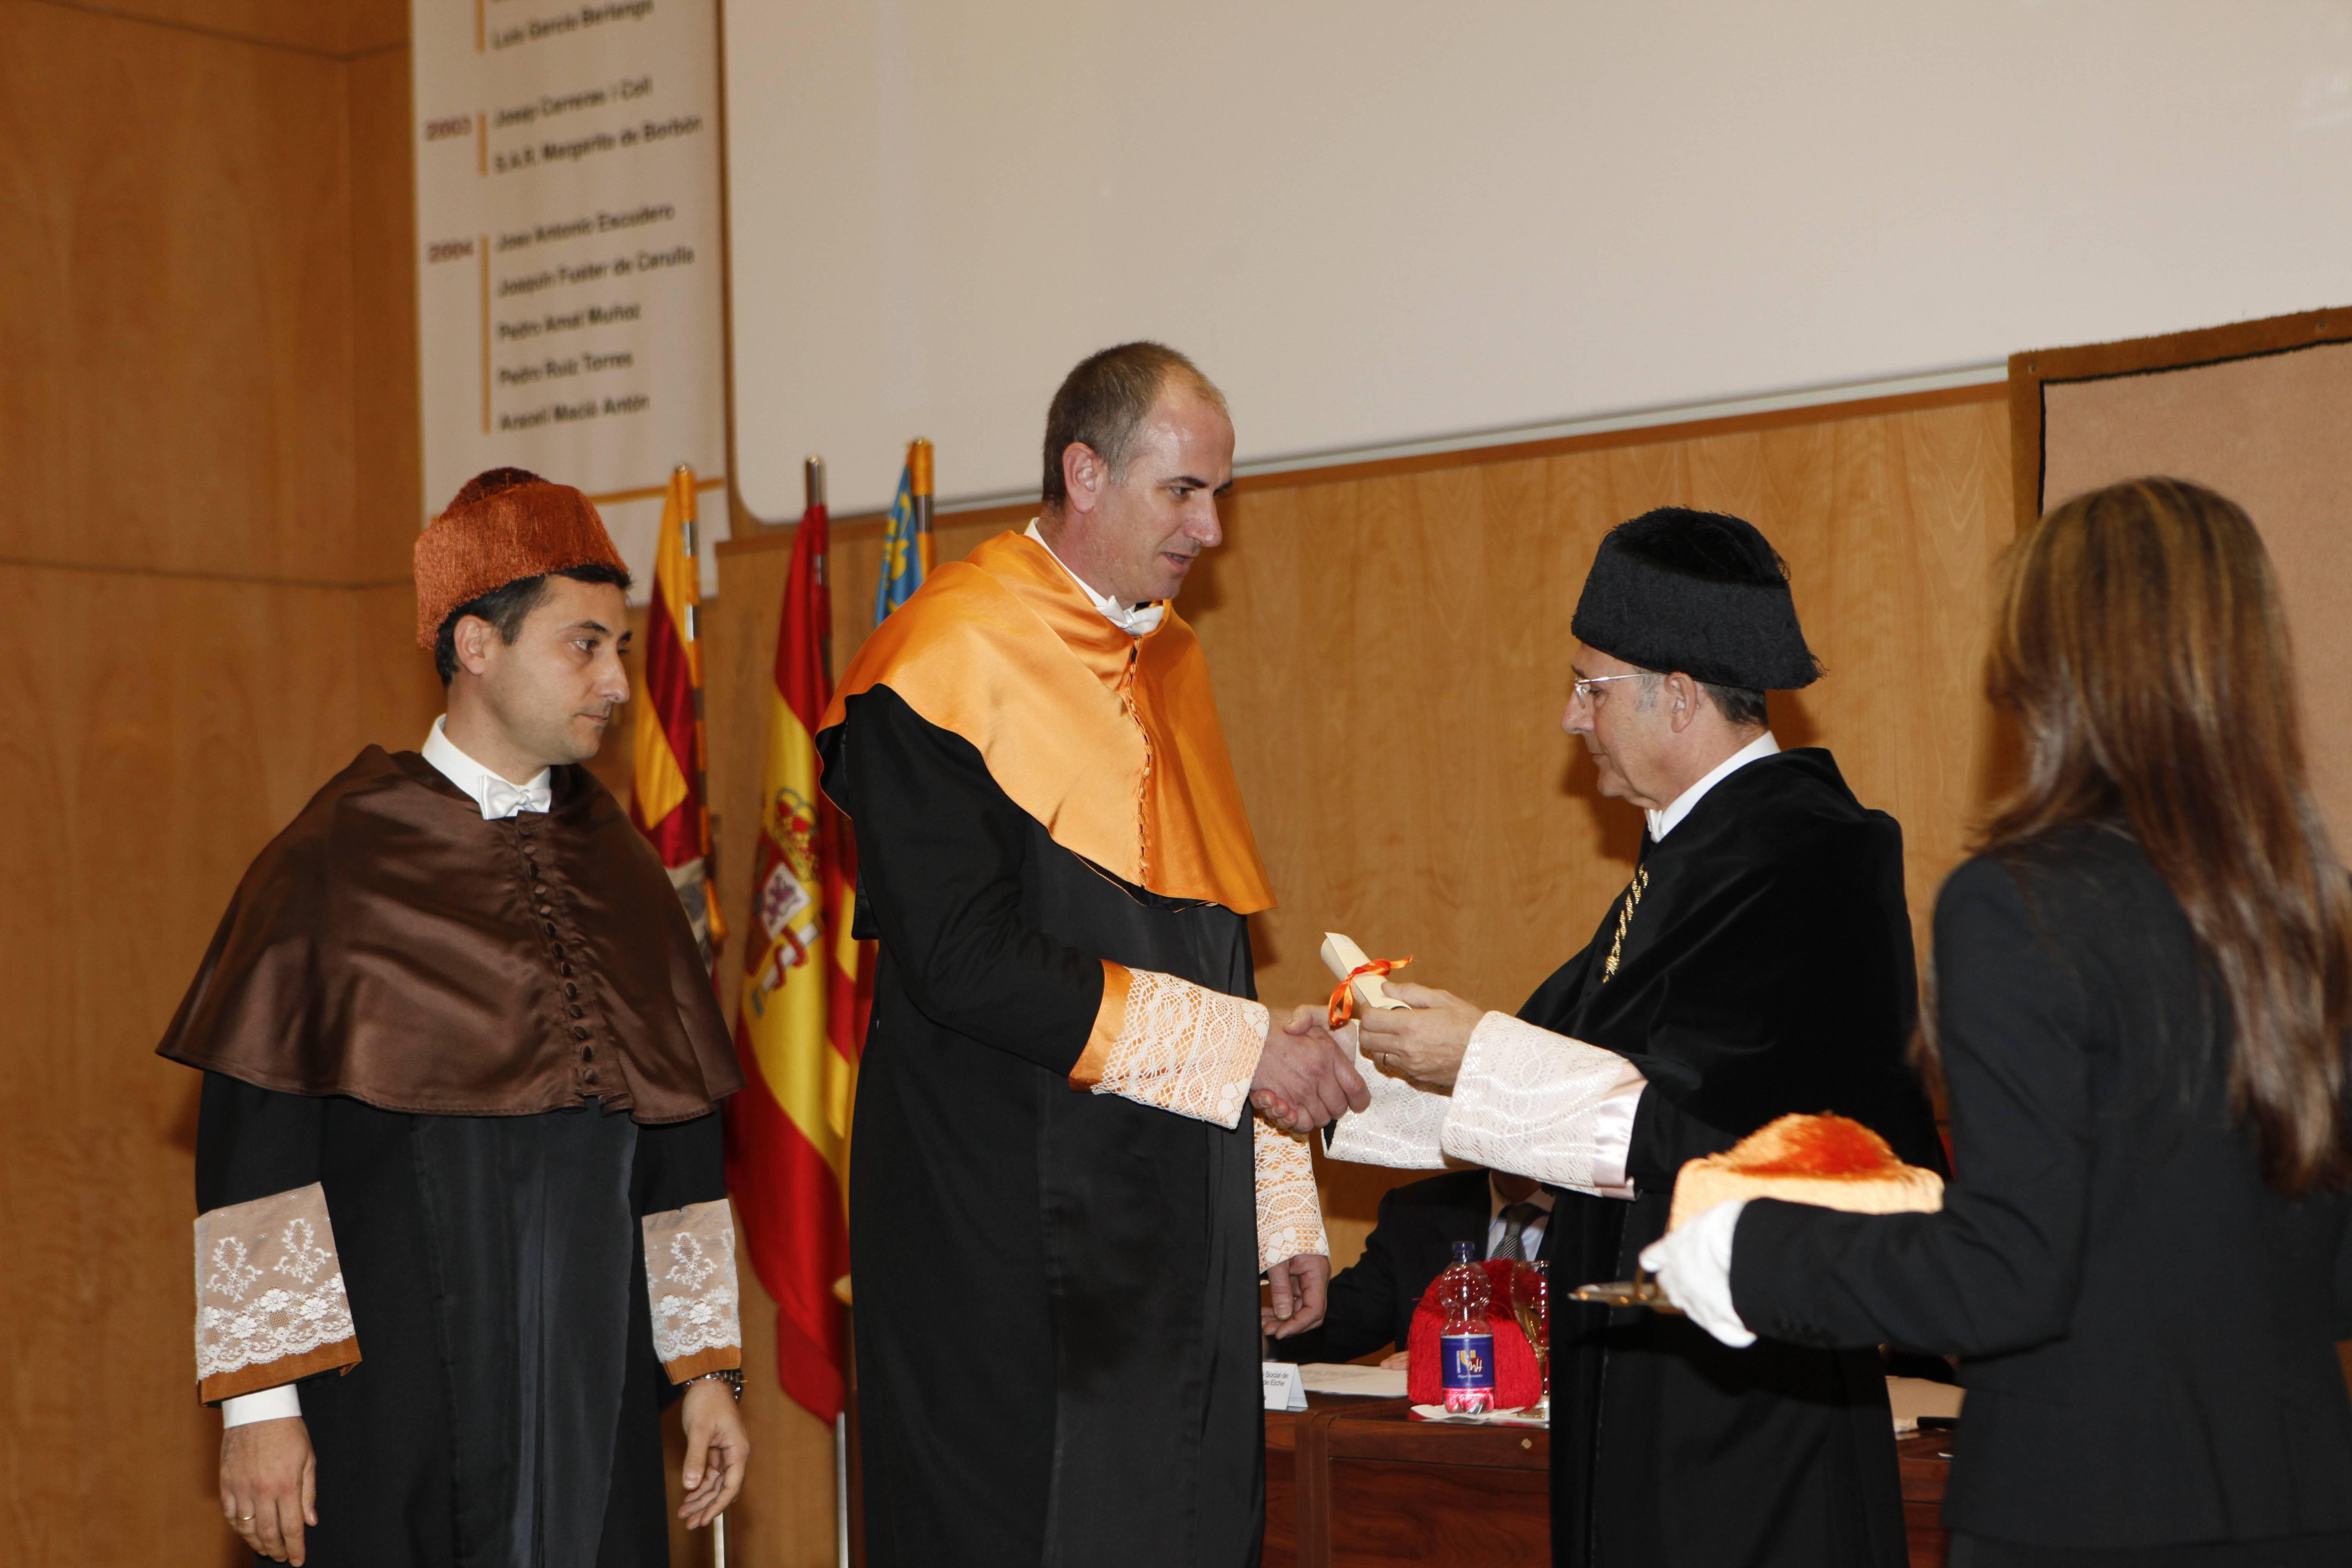 doctor-honoris-causa-luis-gamir_mg_1171.jpg